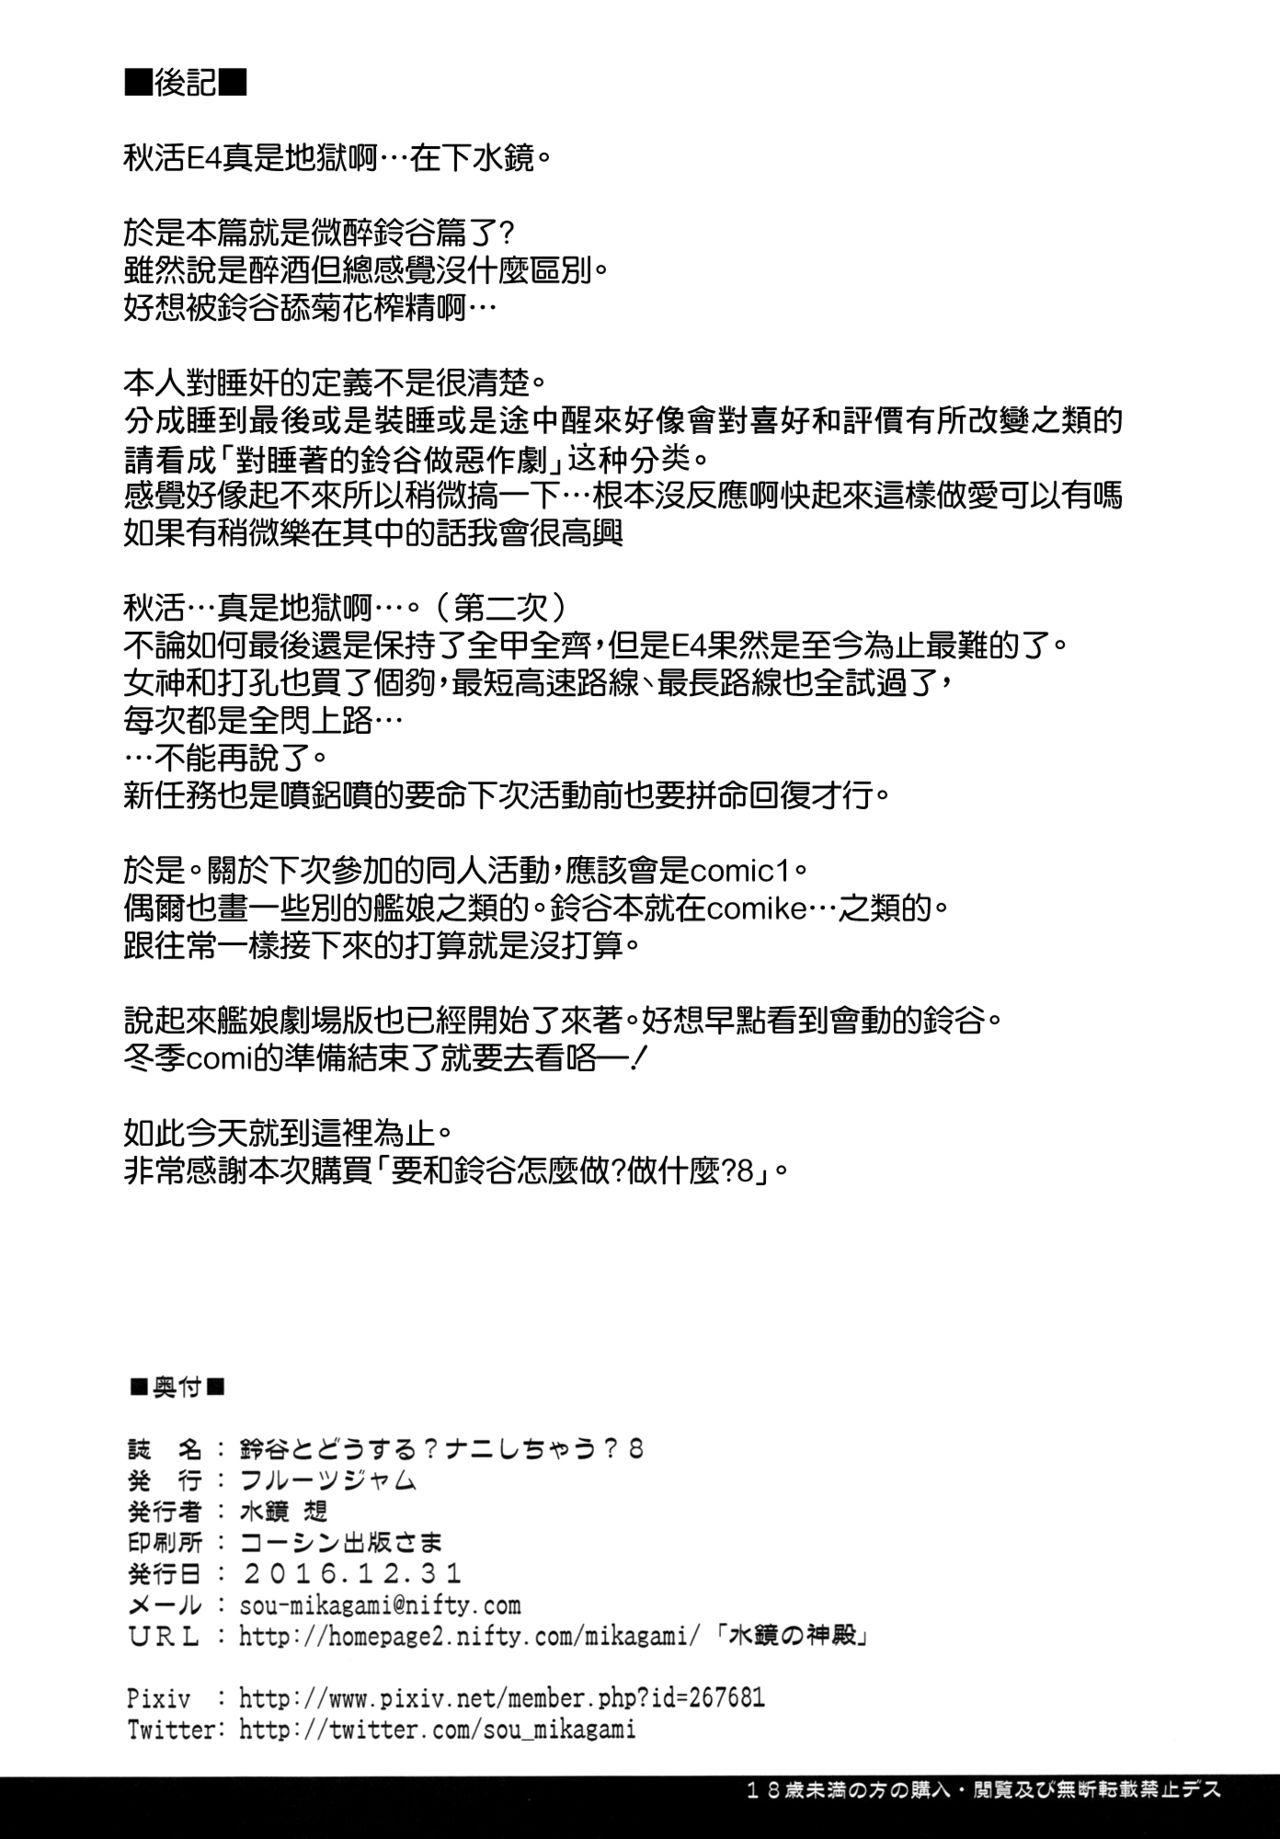 Suzuya to Dousuru? Nanishichau? 8 25